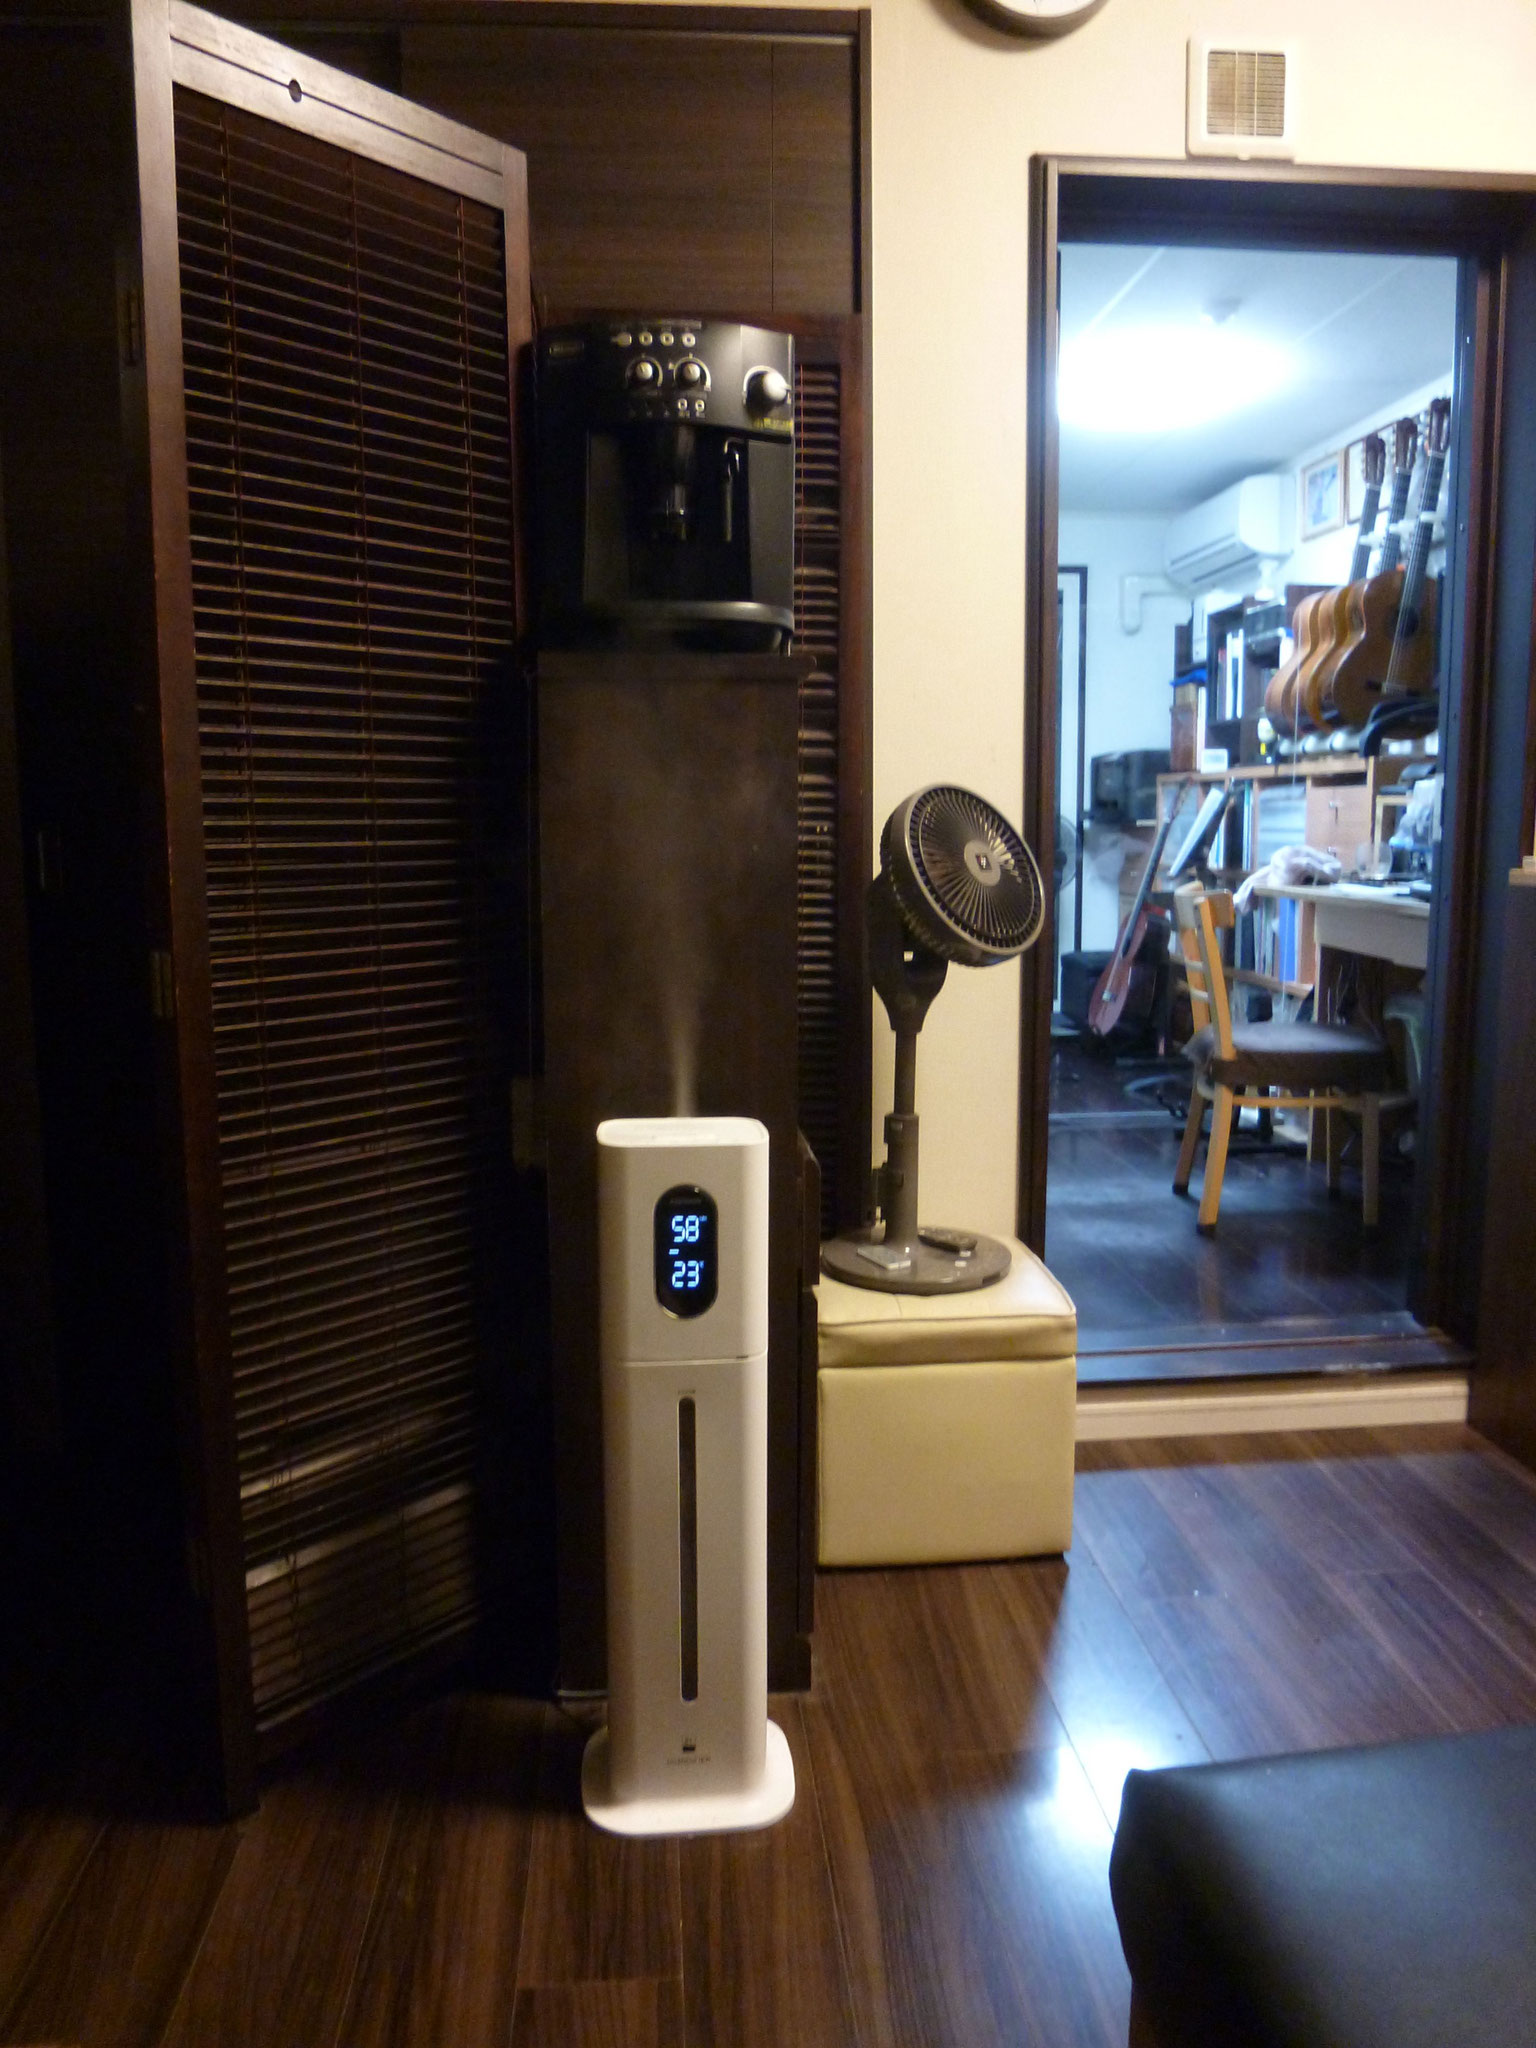 待合いルーム/大型次亜塩素酸水加湿器